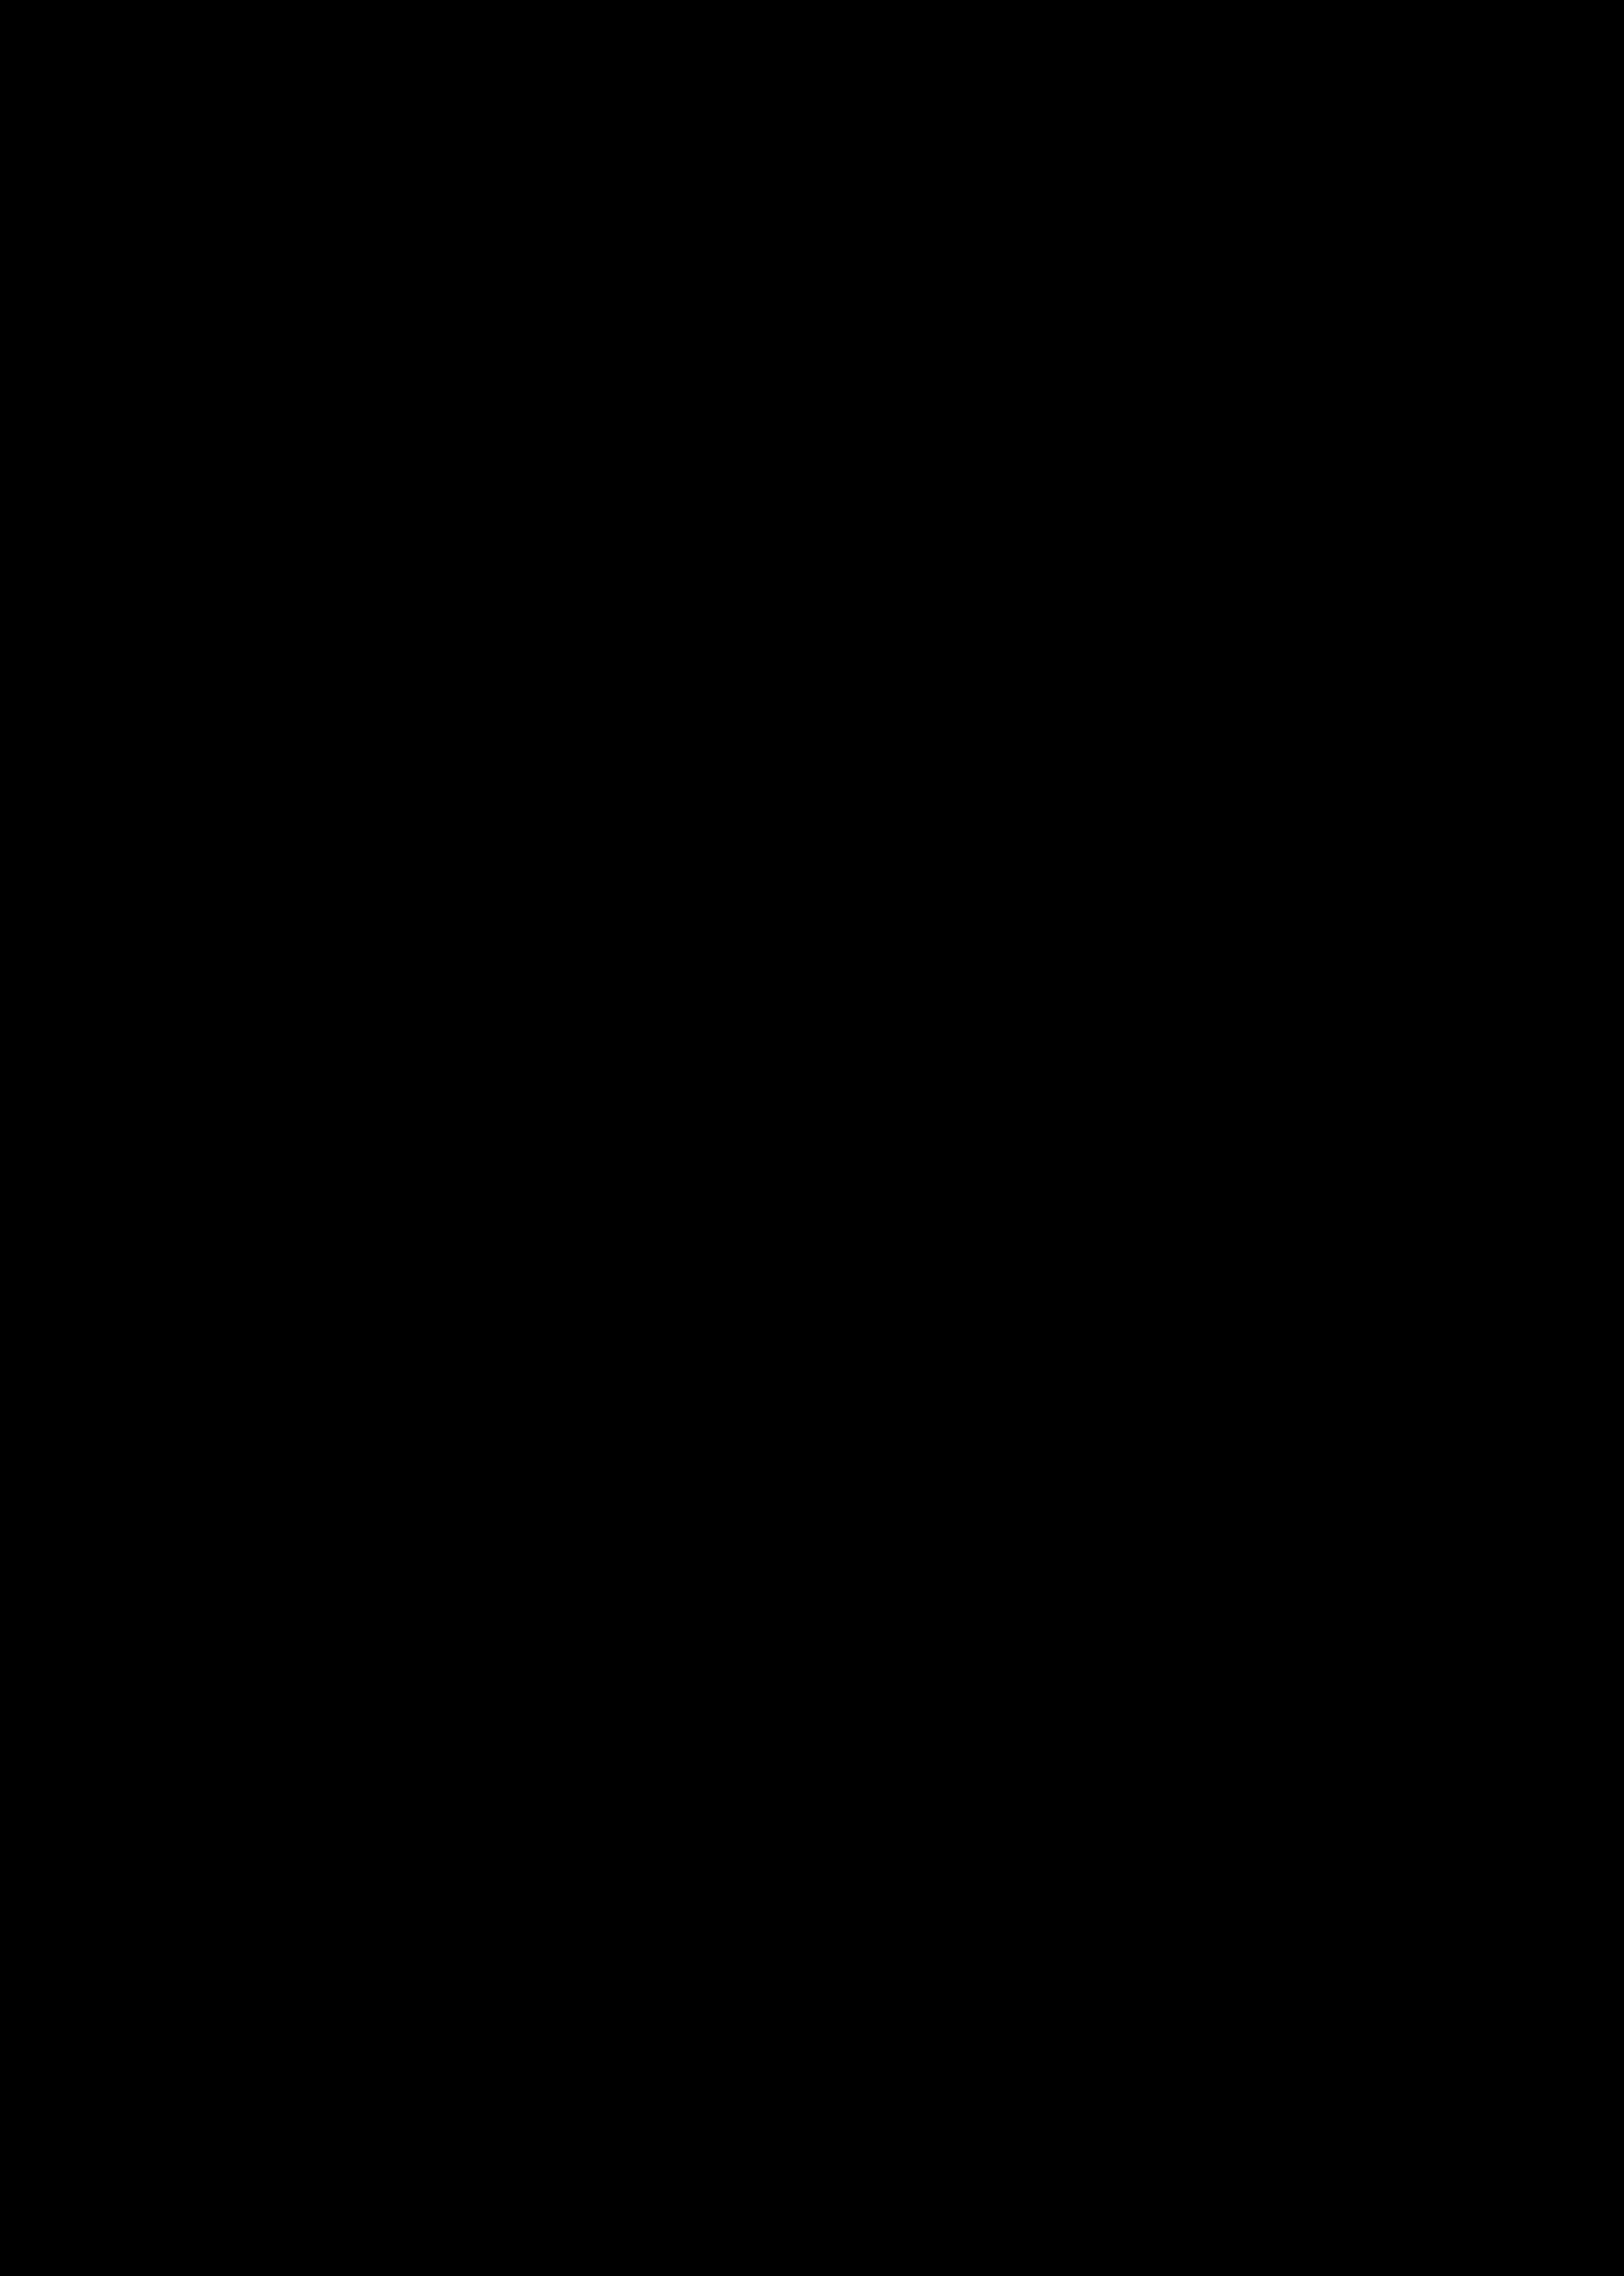 1664x2332 Clipart